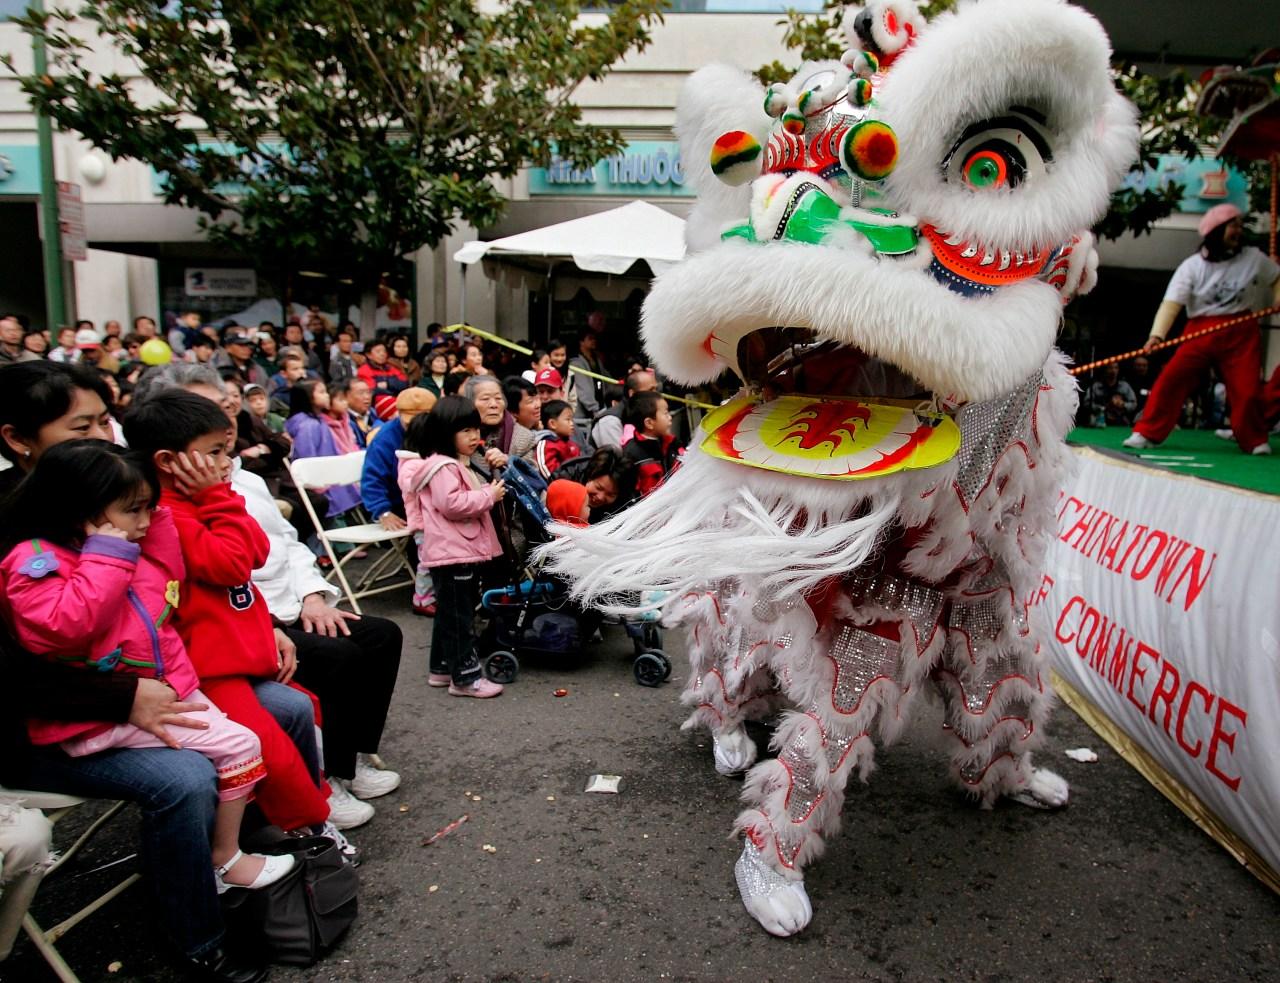 www.wane.com: California's Asian population soars, new census data shows